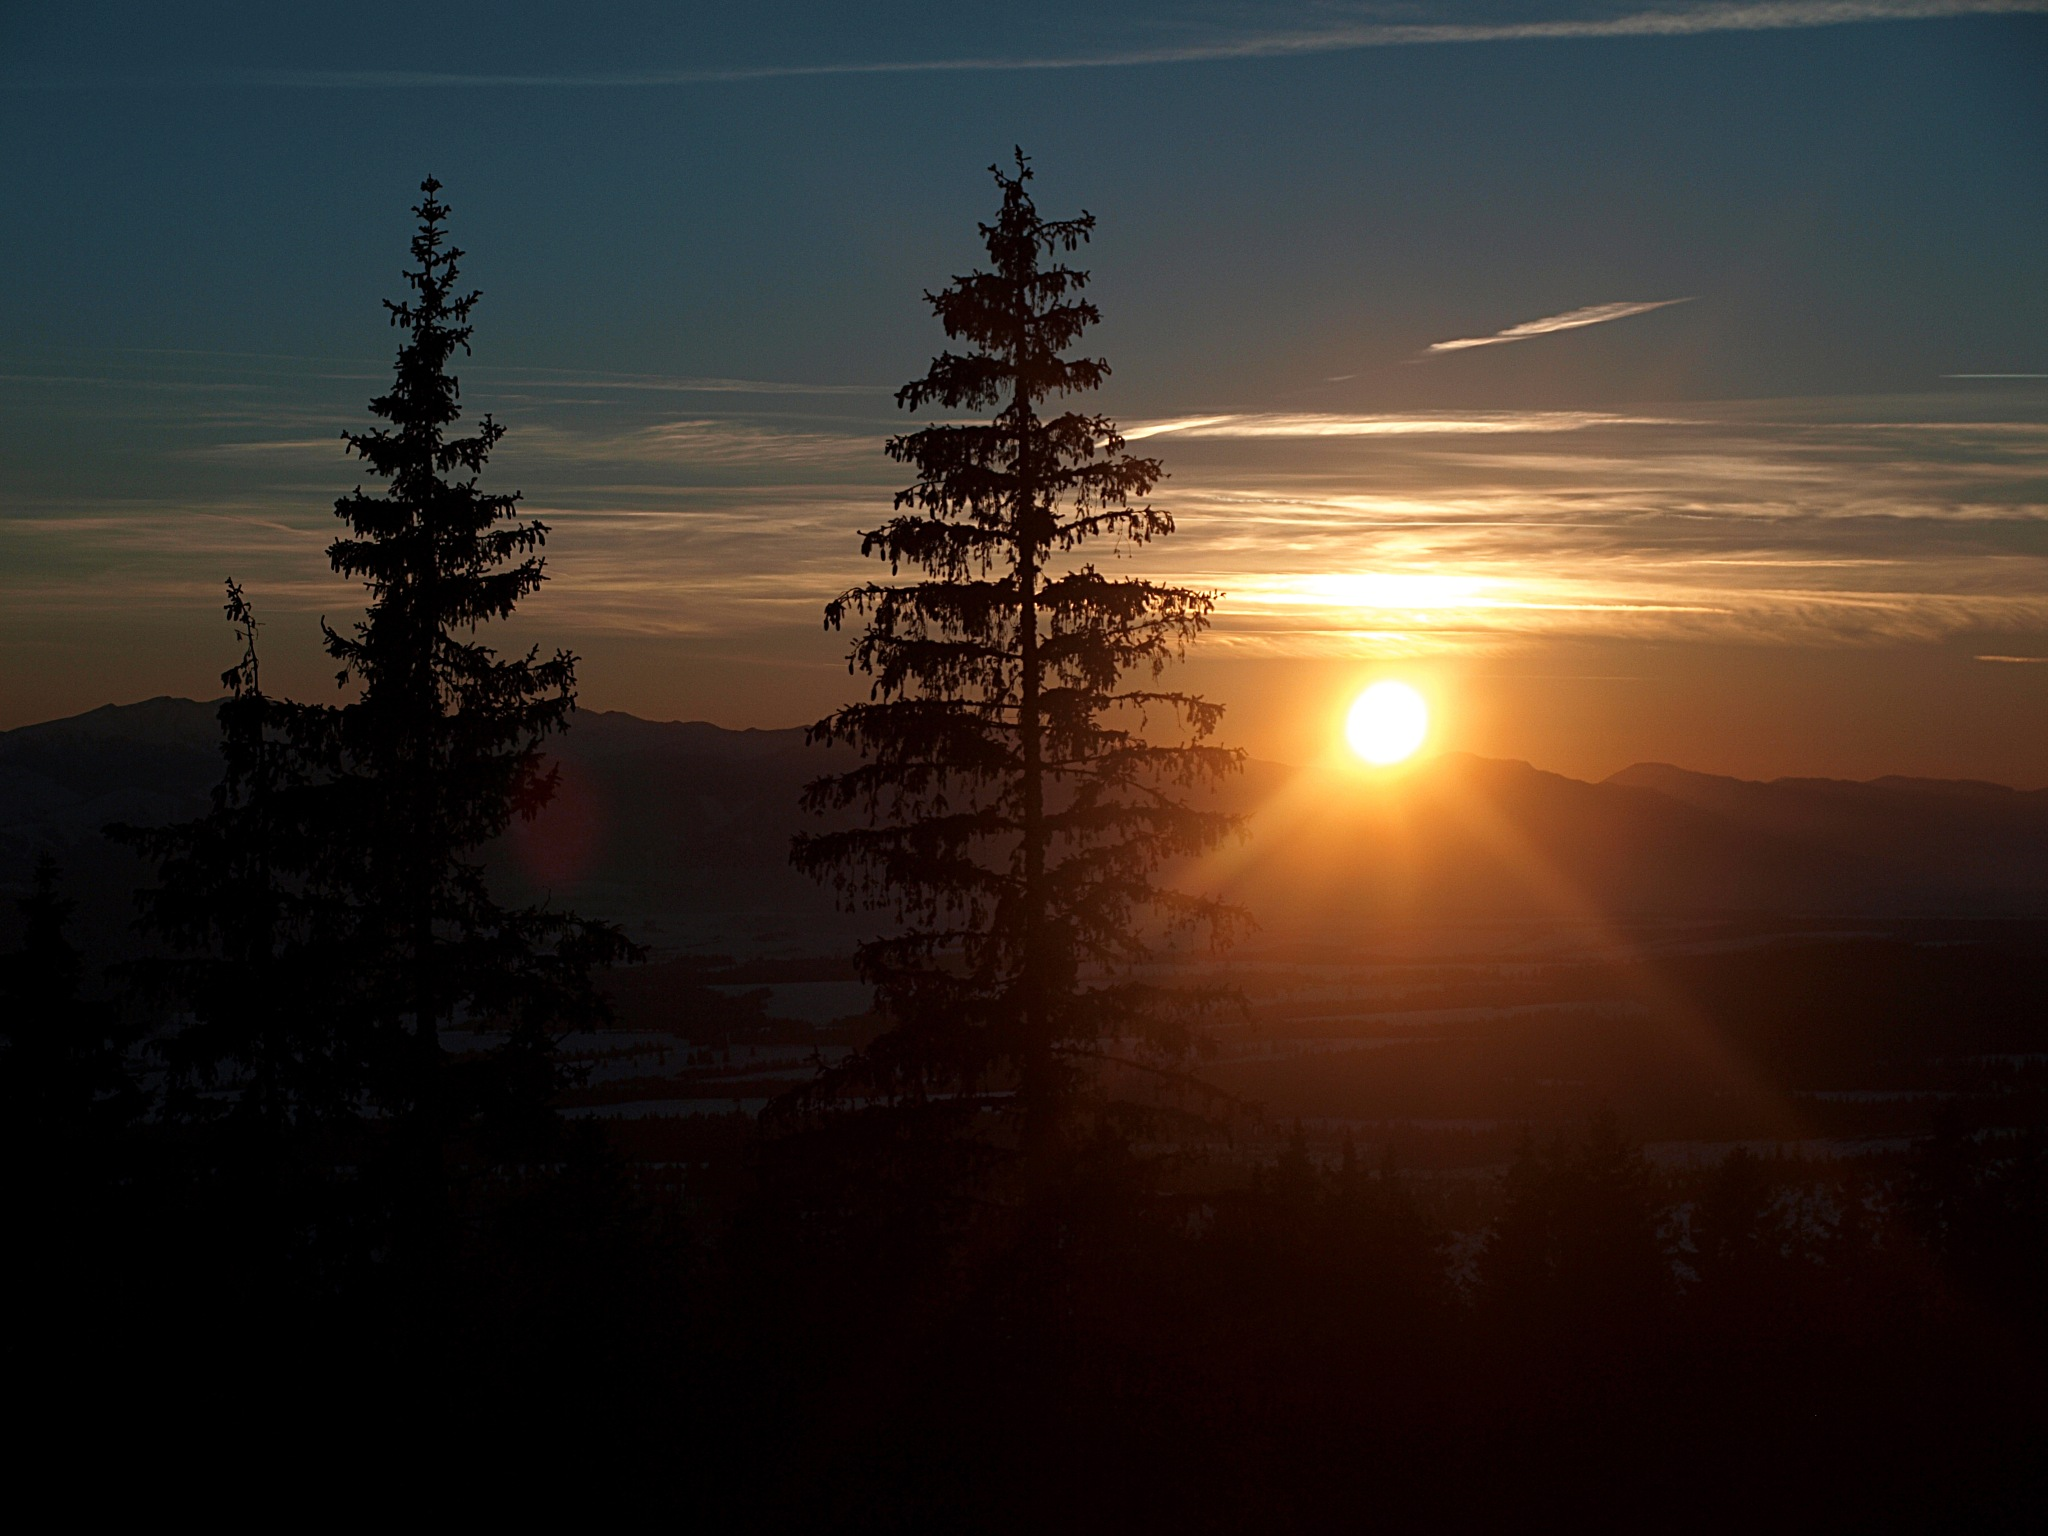 Sunset by Monika Swadowska